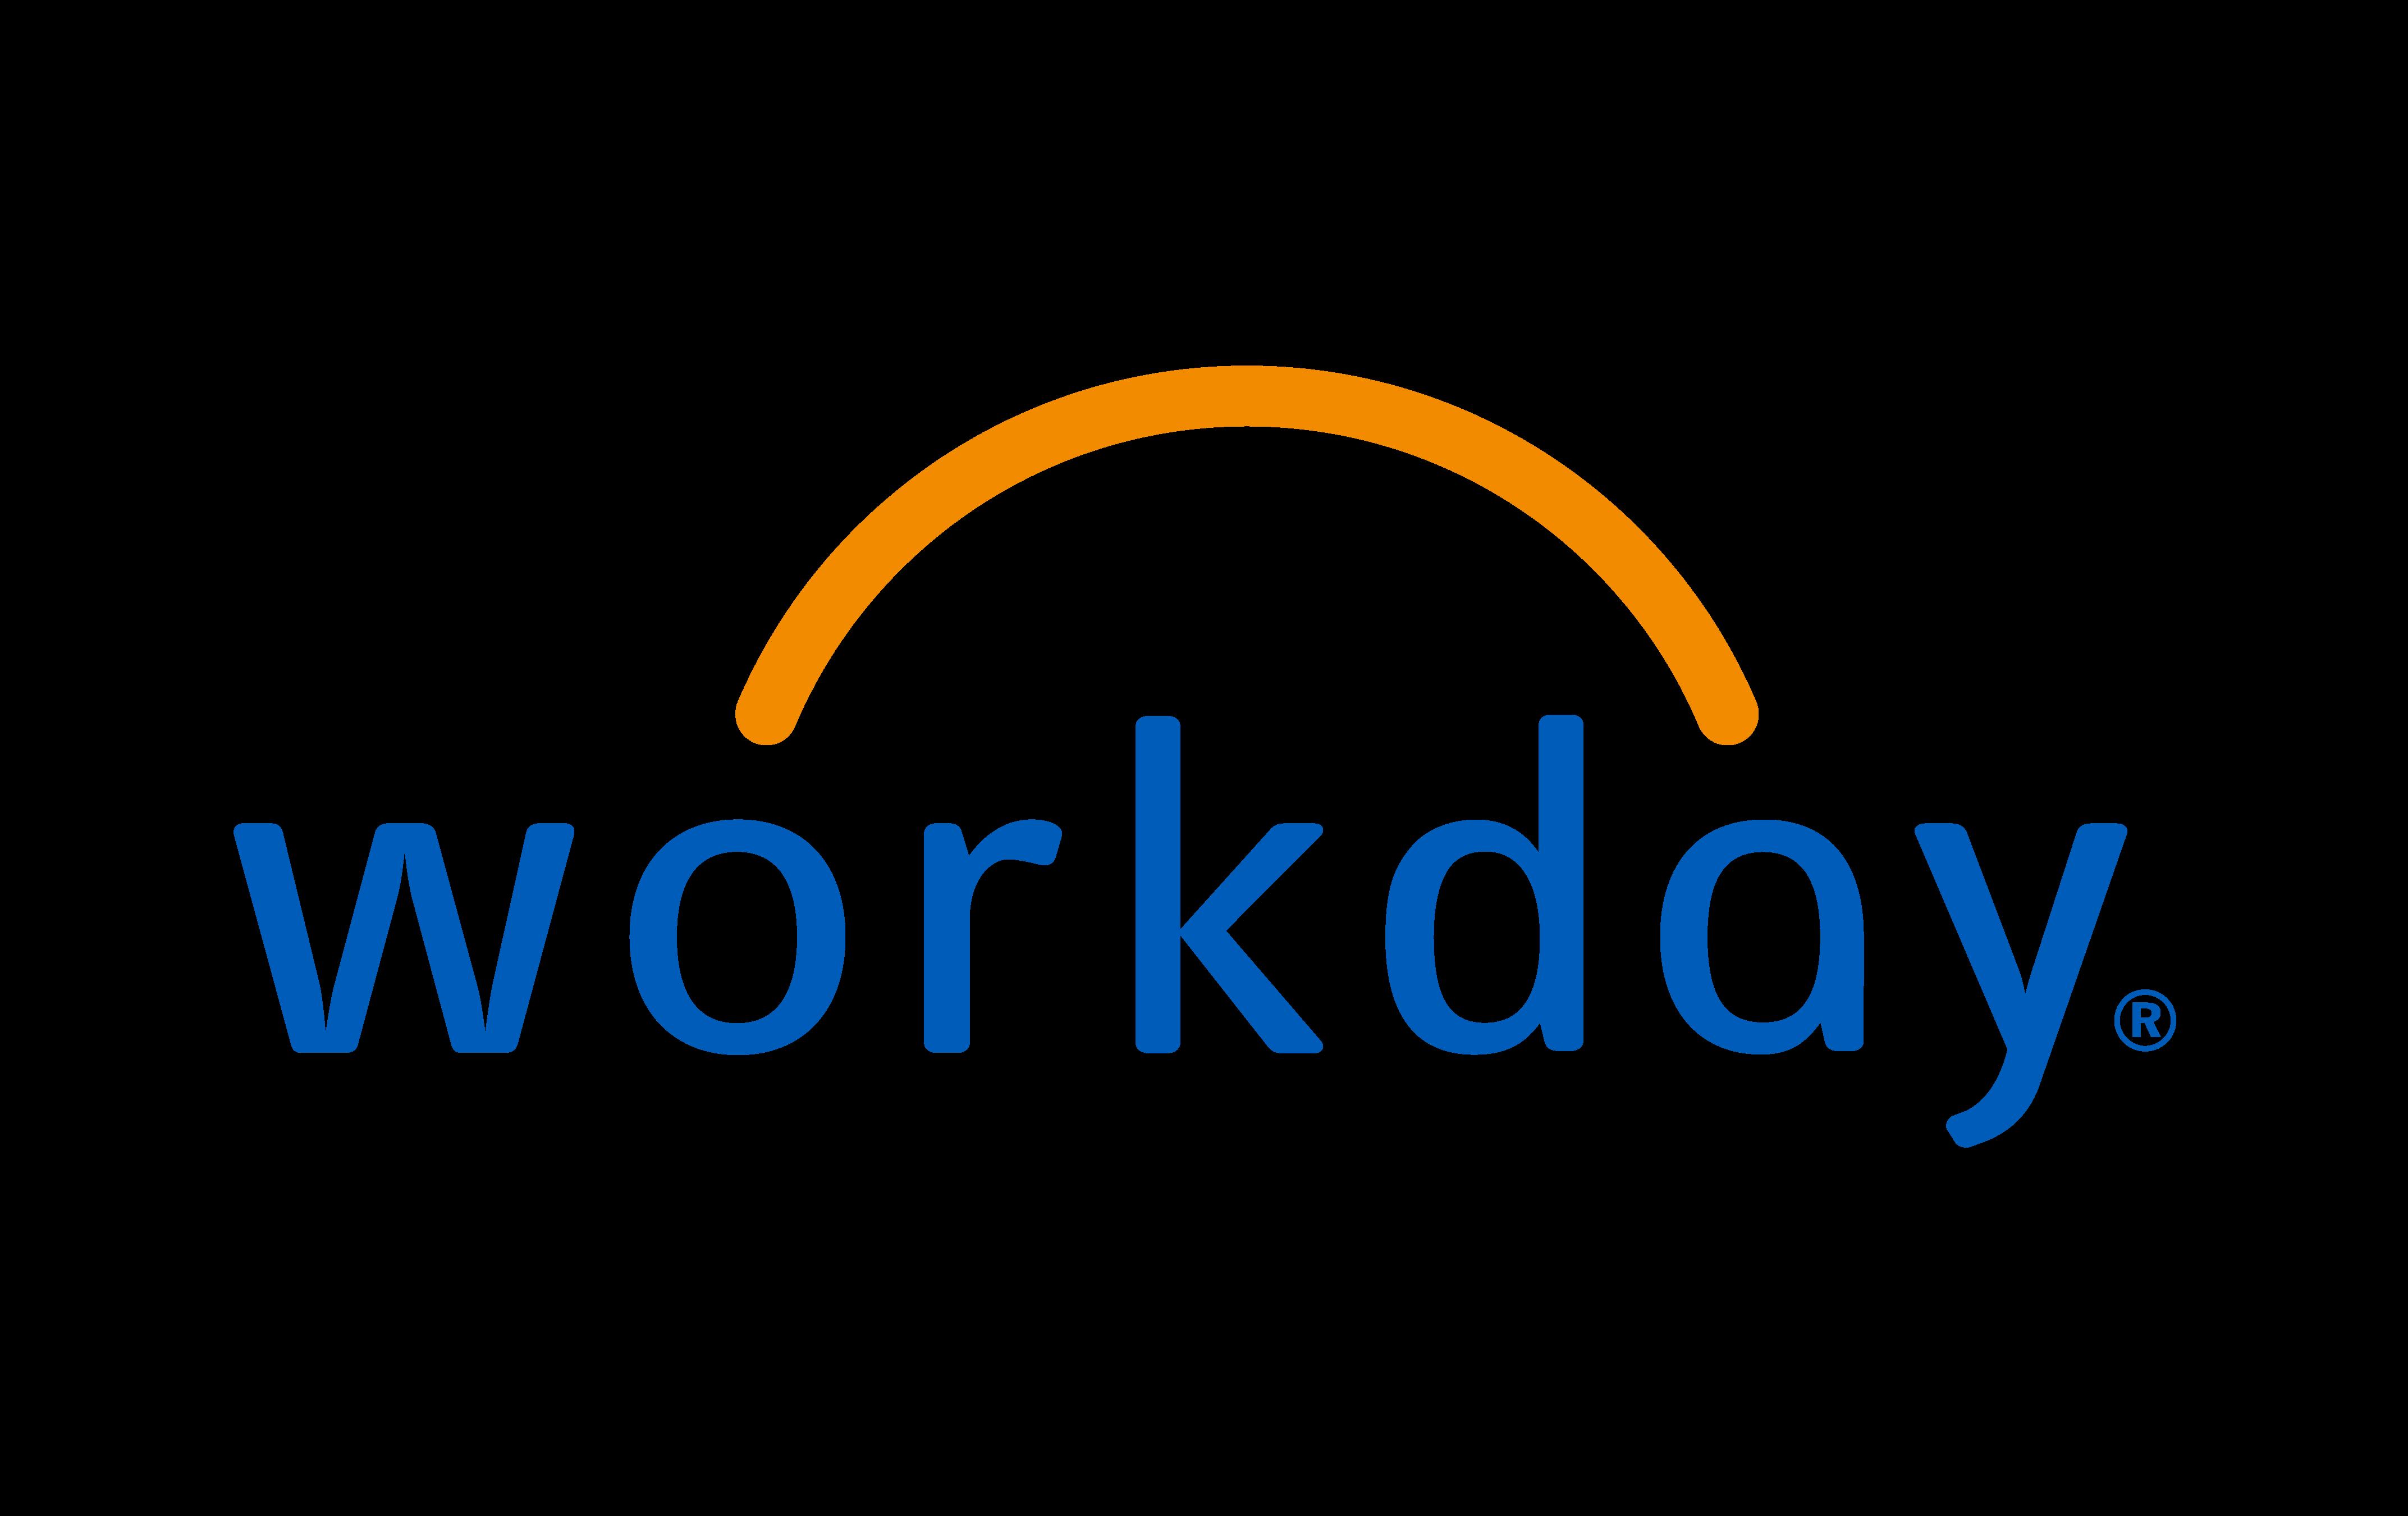 Workday logo_2017